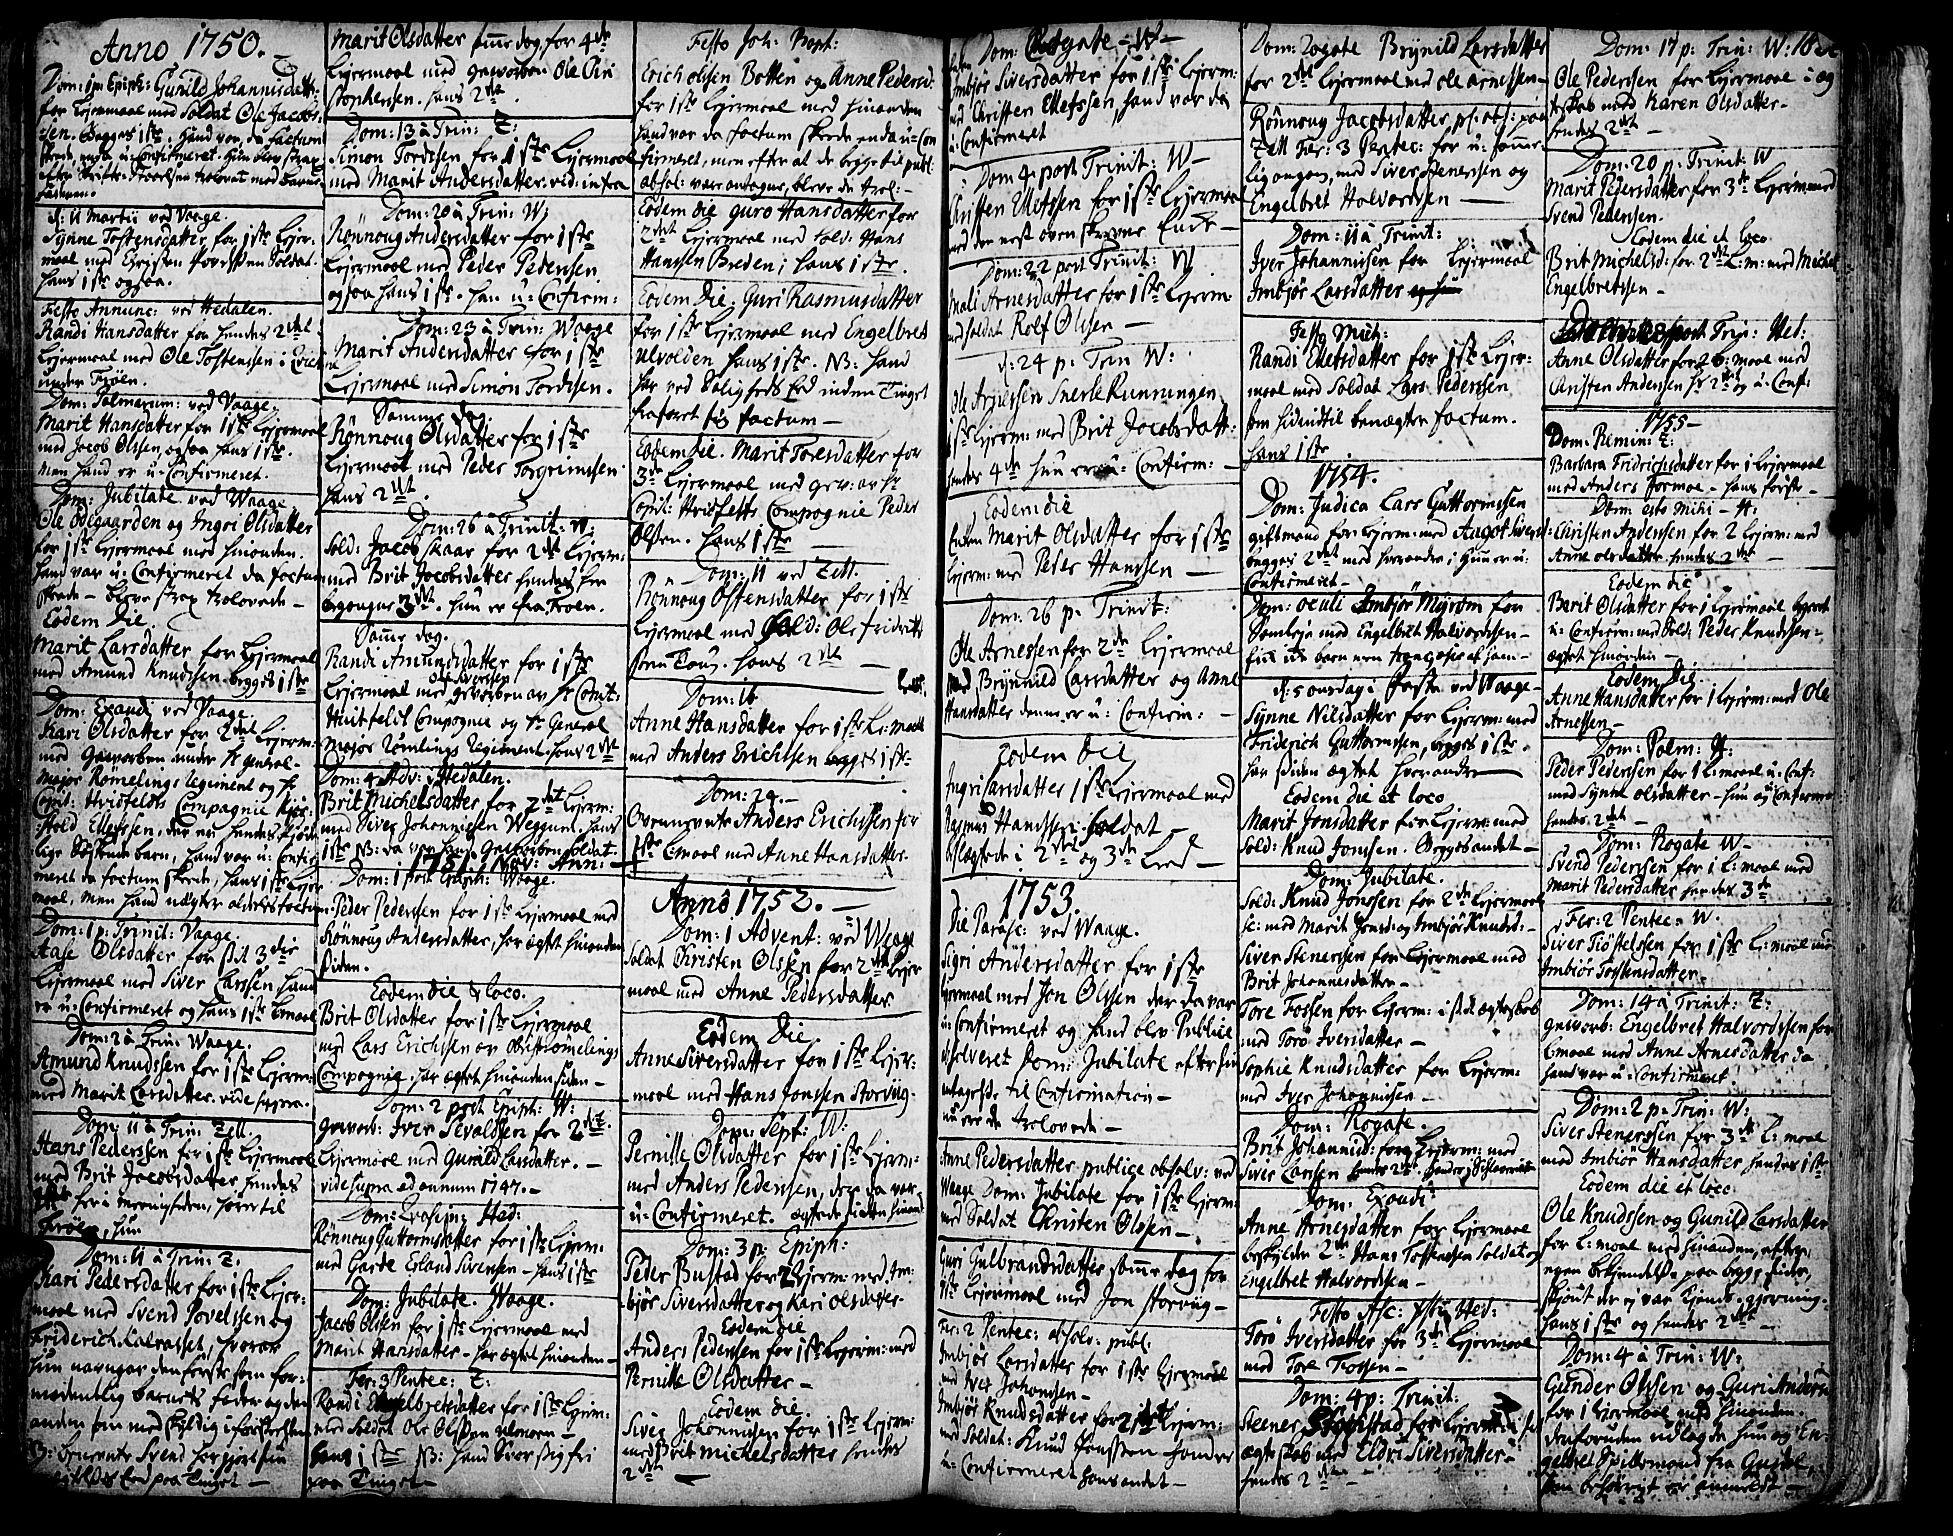 SAH, Vågå prestekontor, Ministerialbok nr. 1, 1739-1810, s. 182